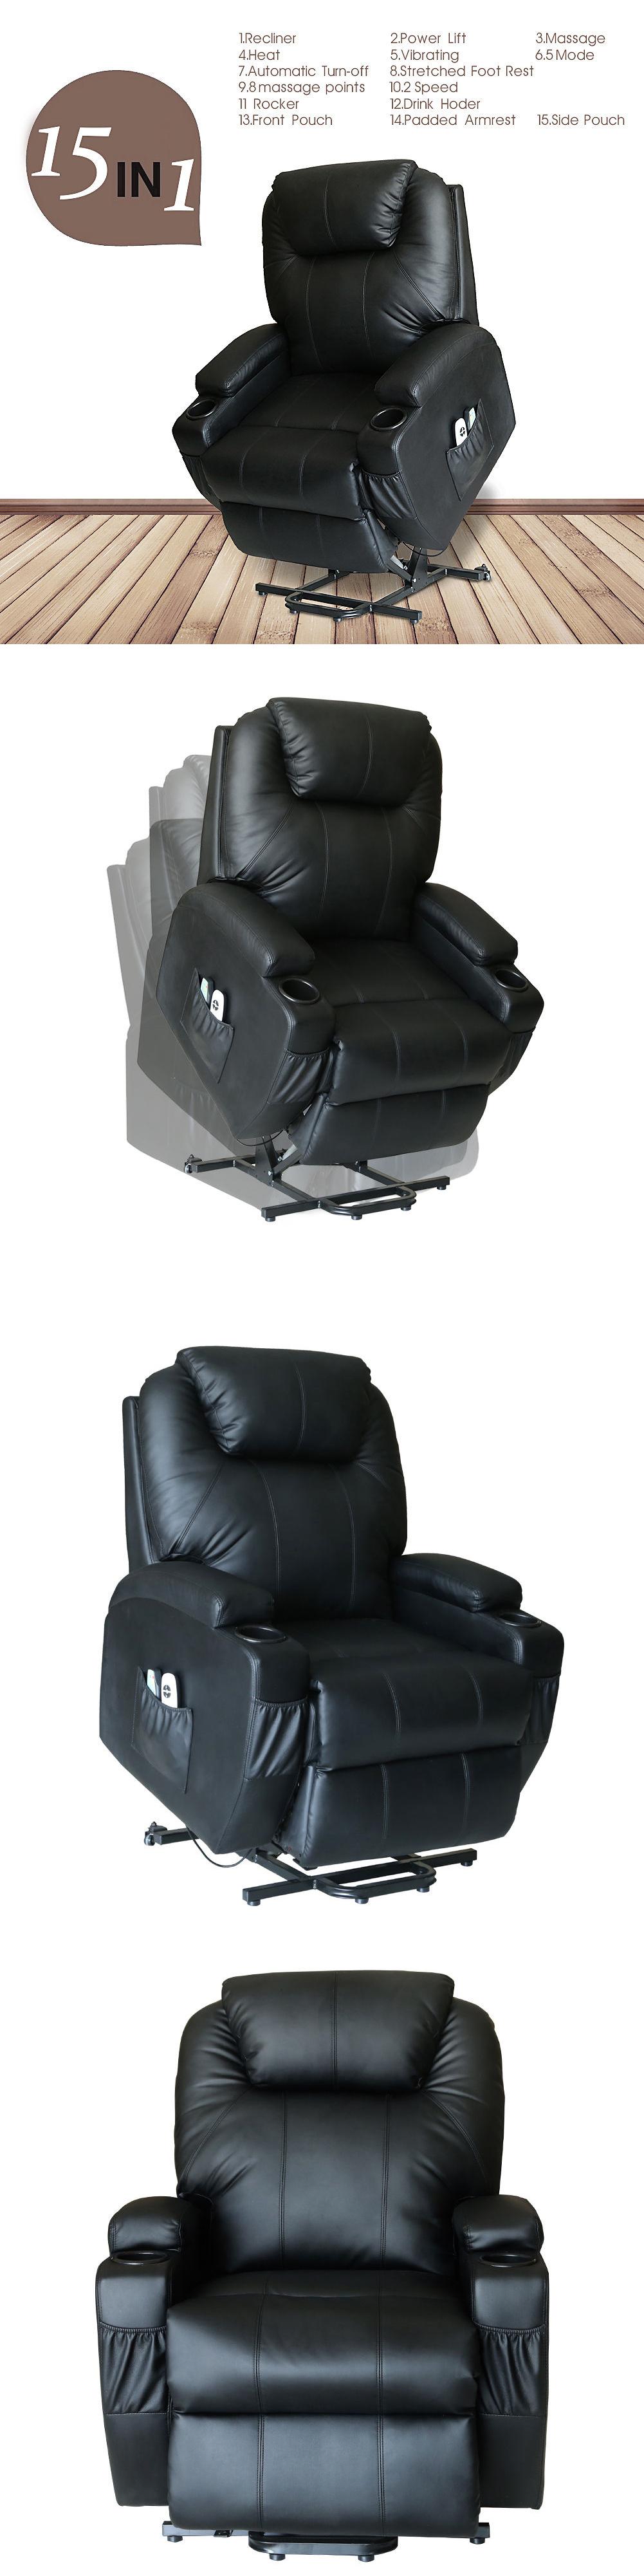 Electric Massage Chairs Shiatsu Electric Massage Chair Integrated